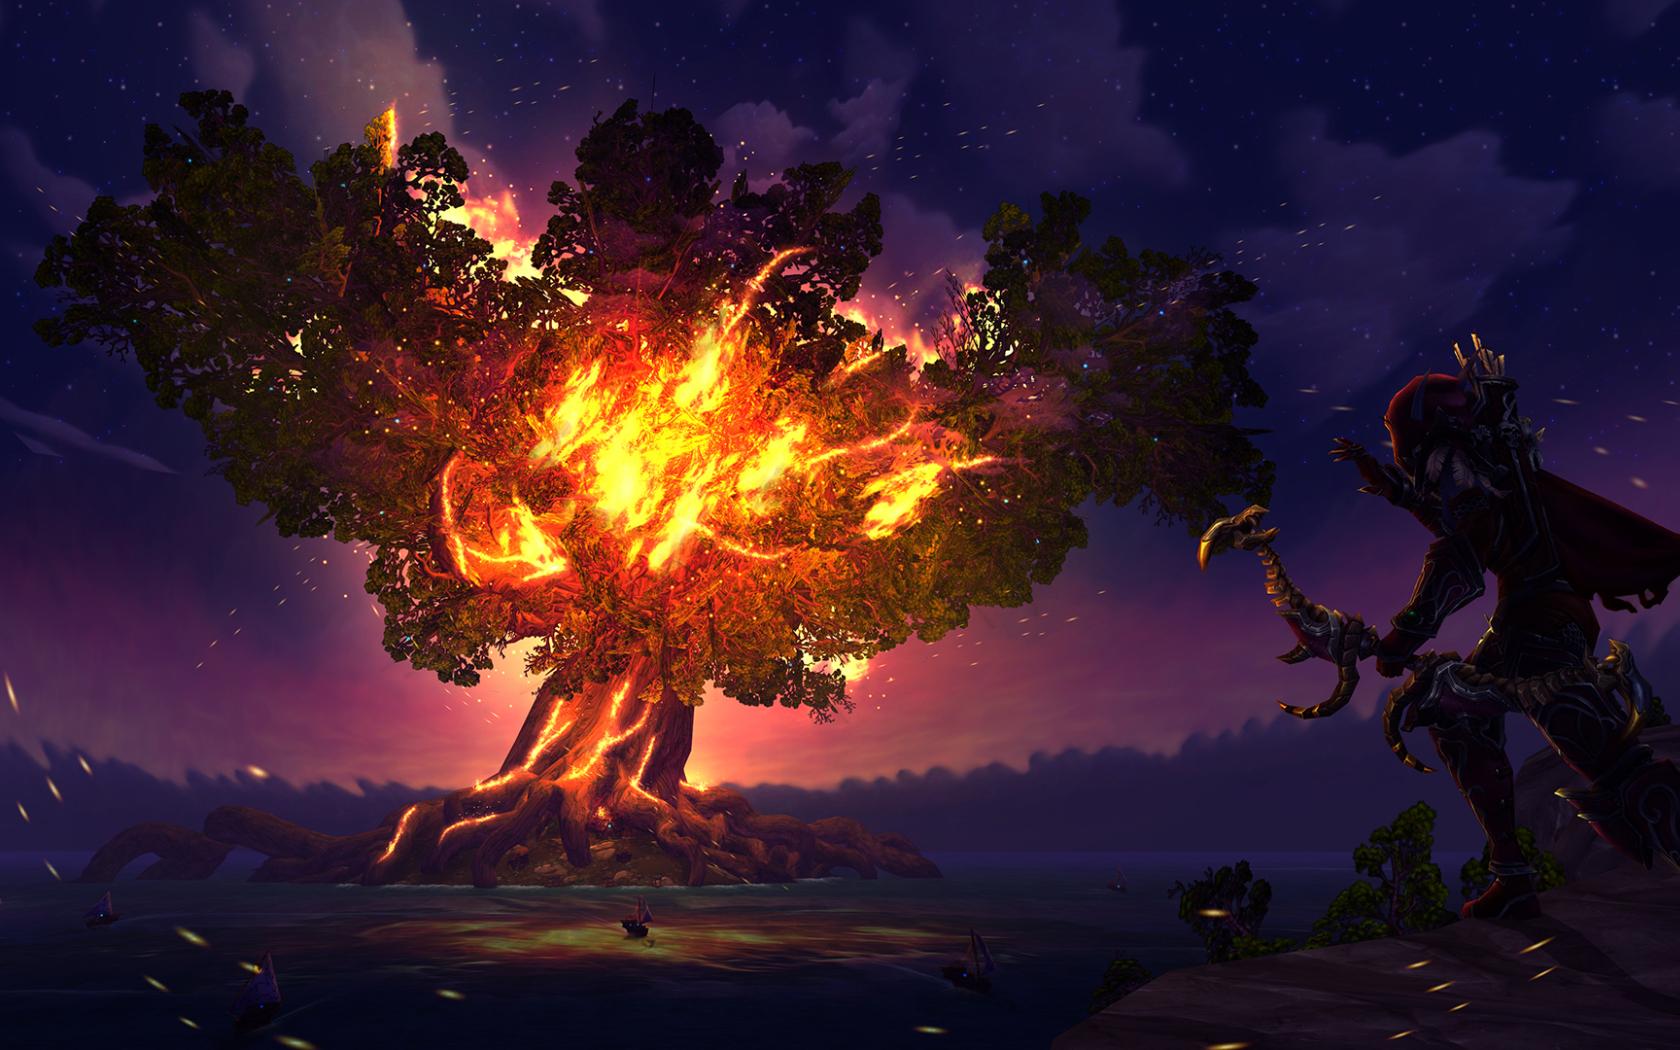 Sylvanas Windrunner Fire Tree World Of Warcraft Full Hd